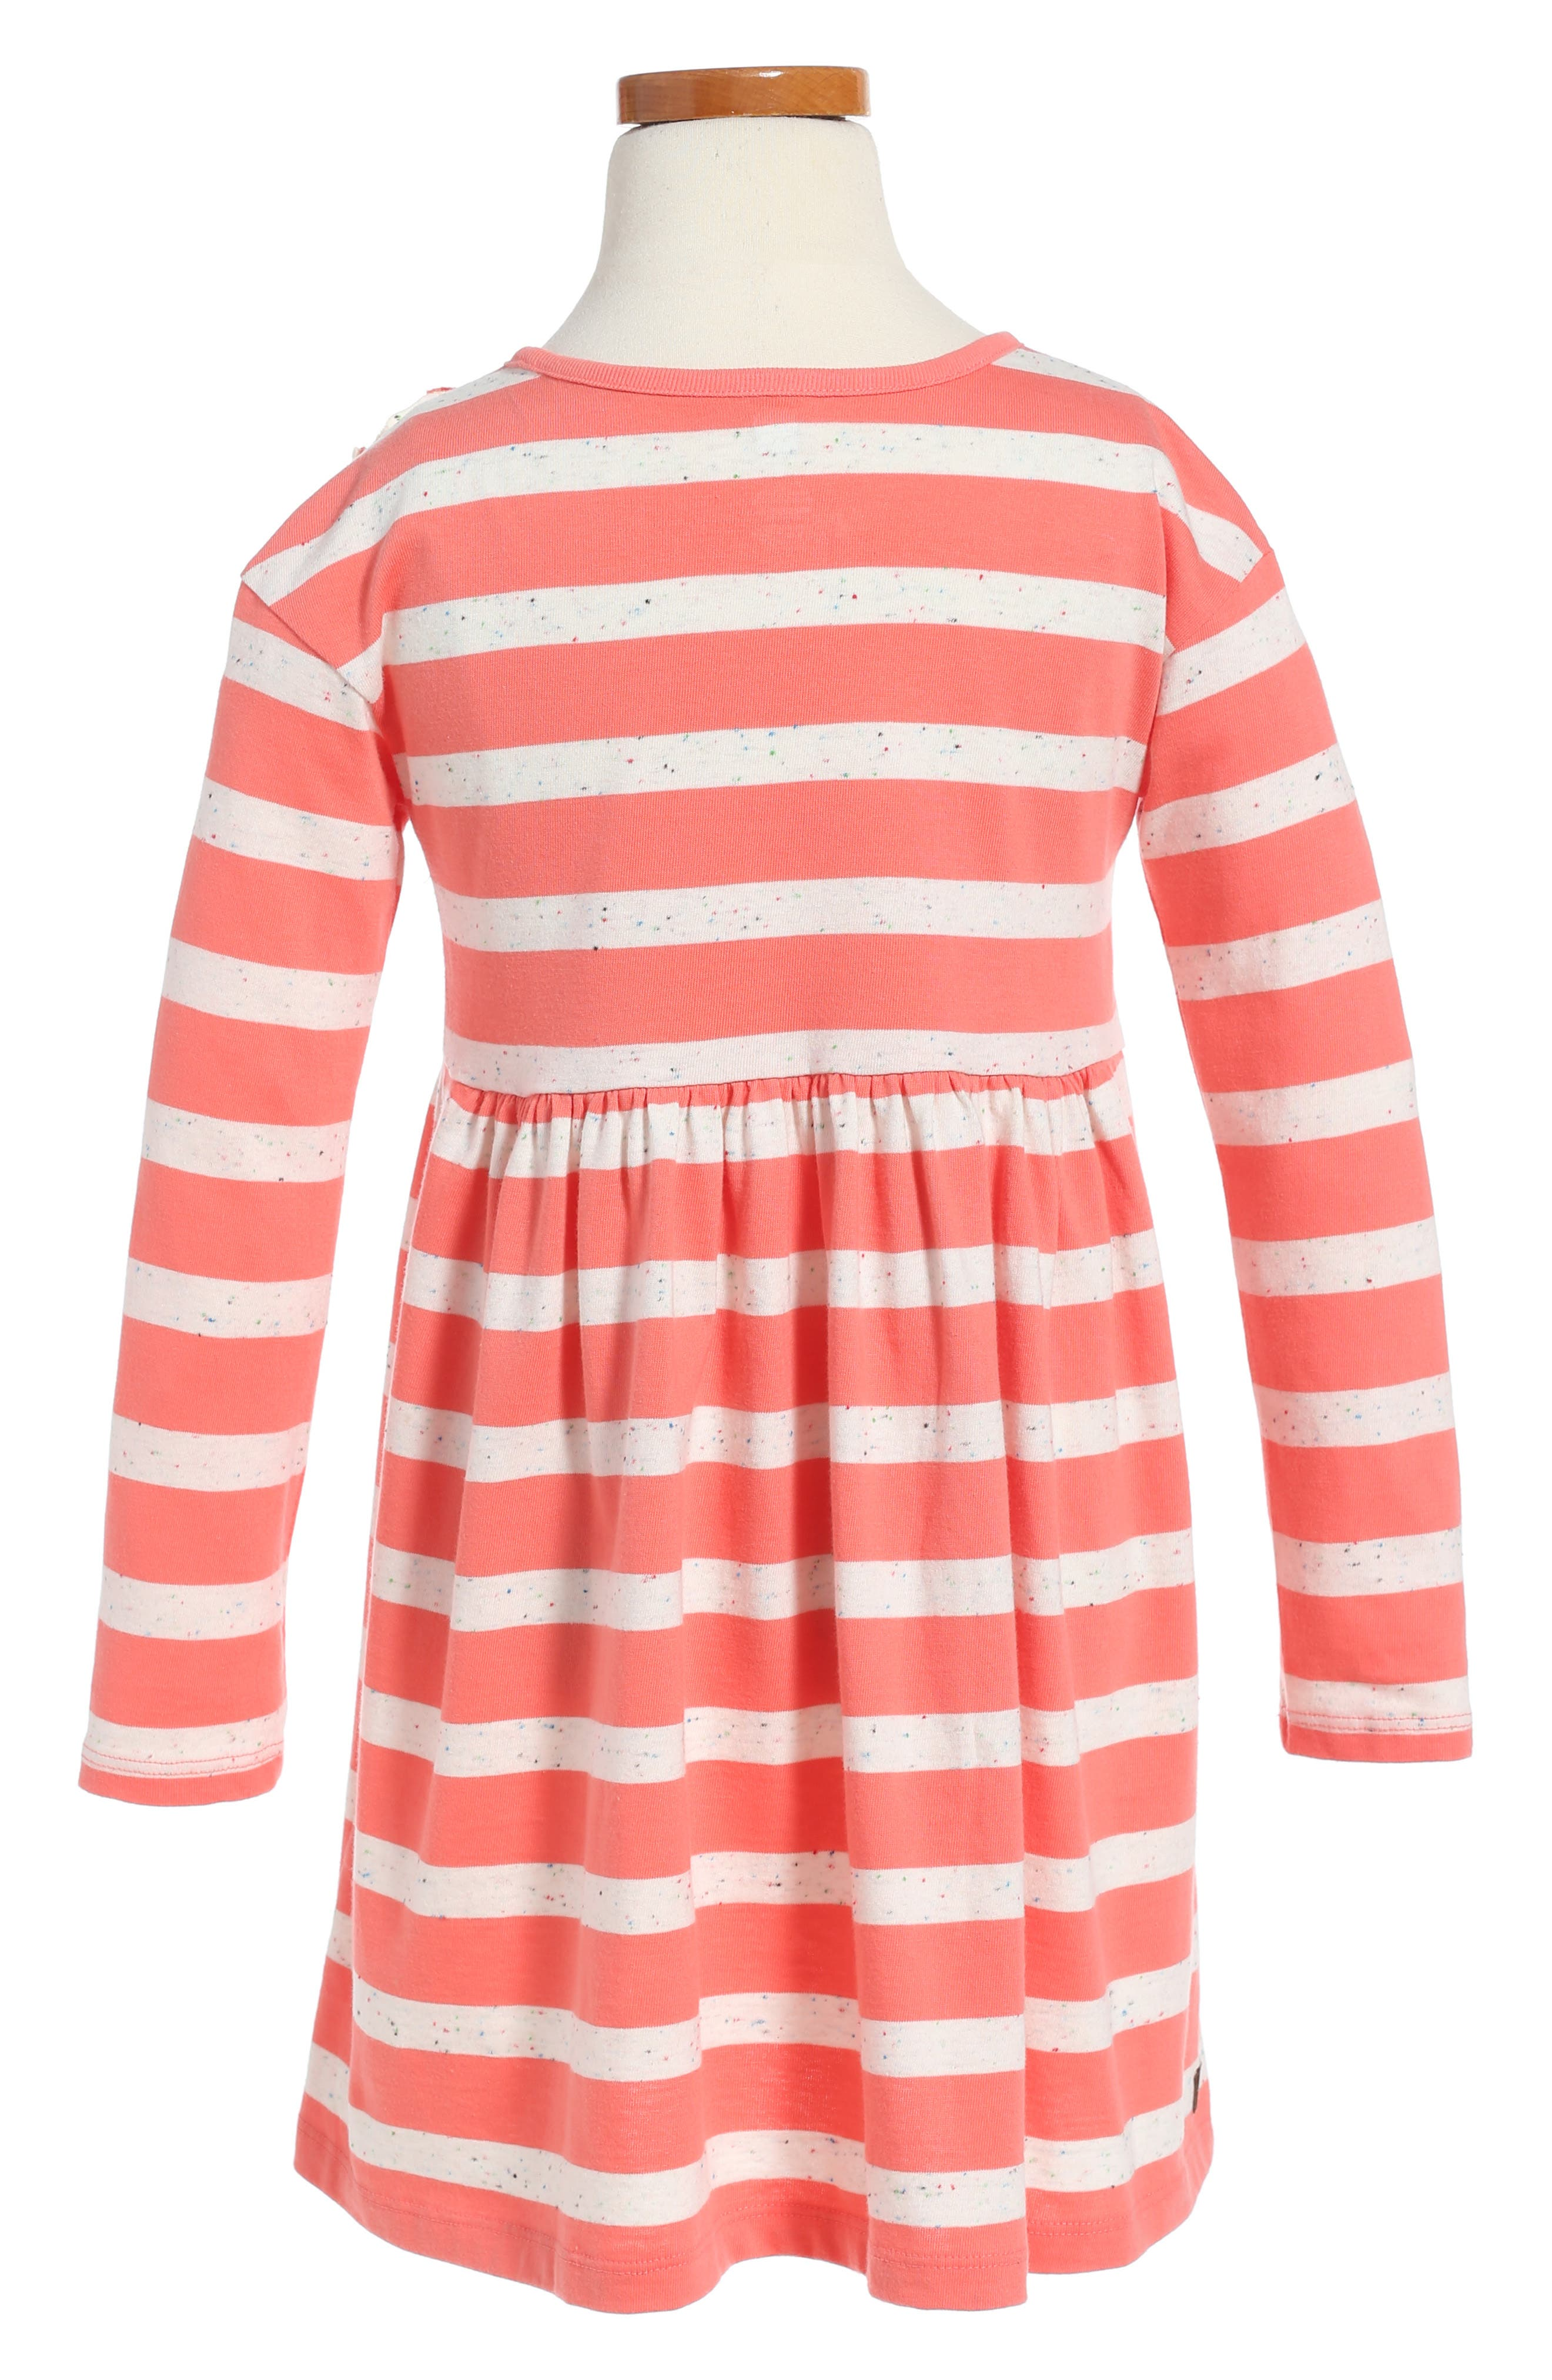 Saorsa Appliqué Dress,                             Alternate thumbnail 2, color,                             Orange Buoy